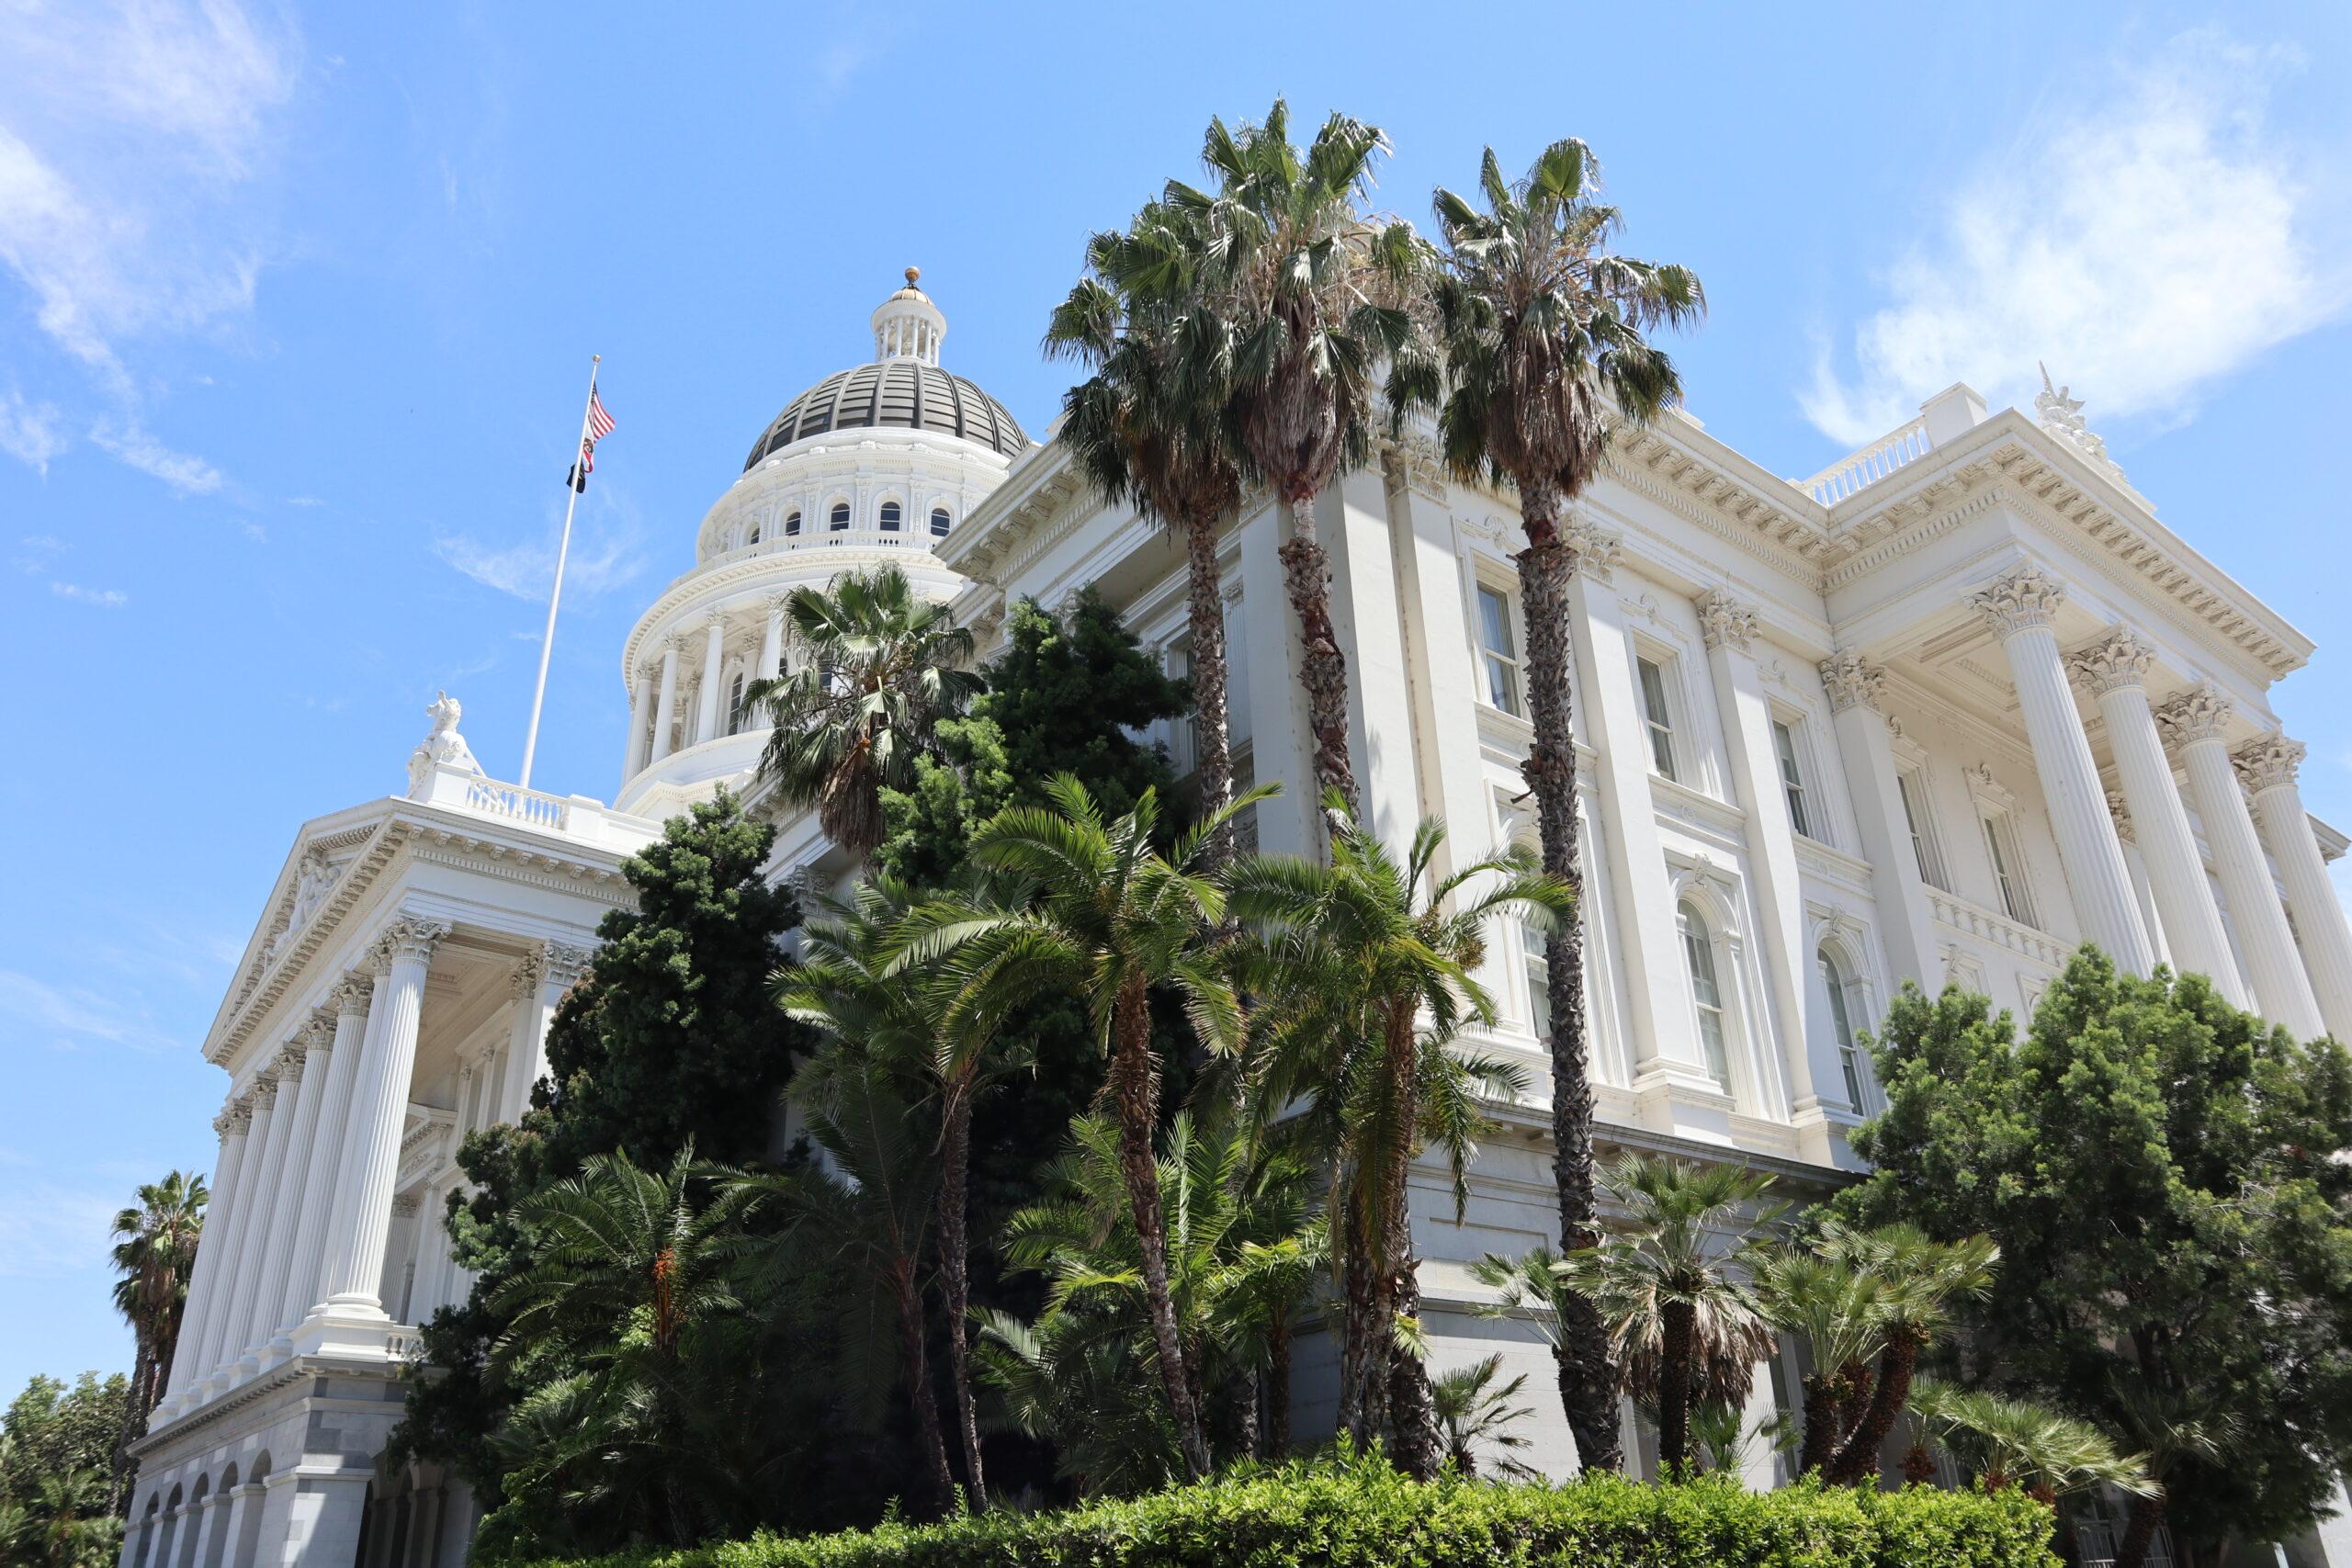 California State Capitol Building in Sacramento, California